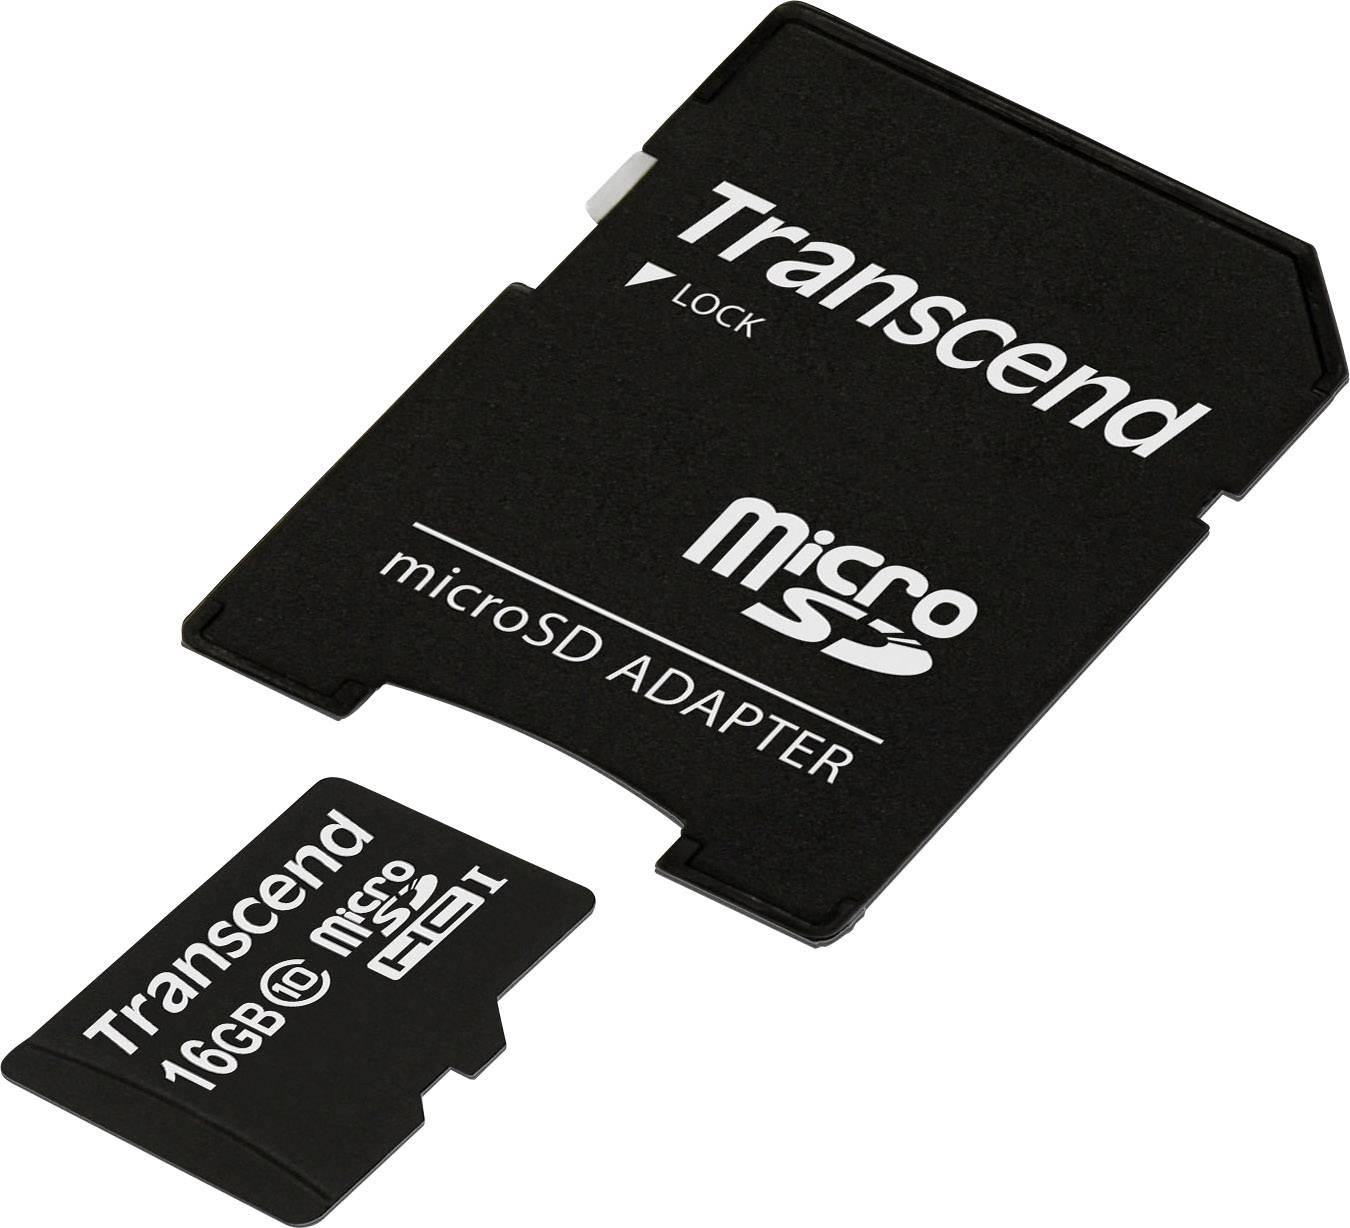 Pametova Karta Micro Sdhc 16 Gb Transcend Premium Class 10 Uhs I Vc